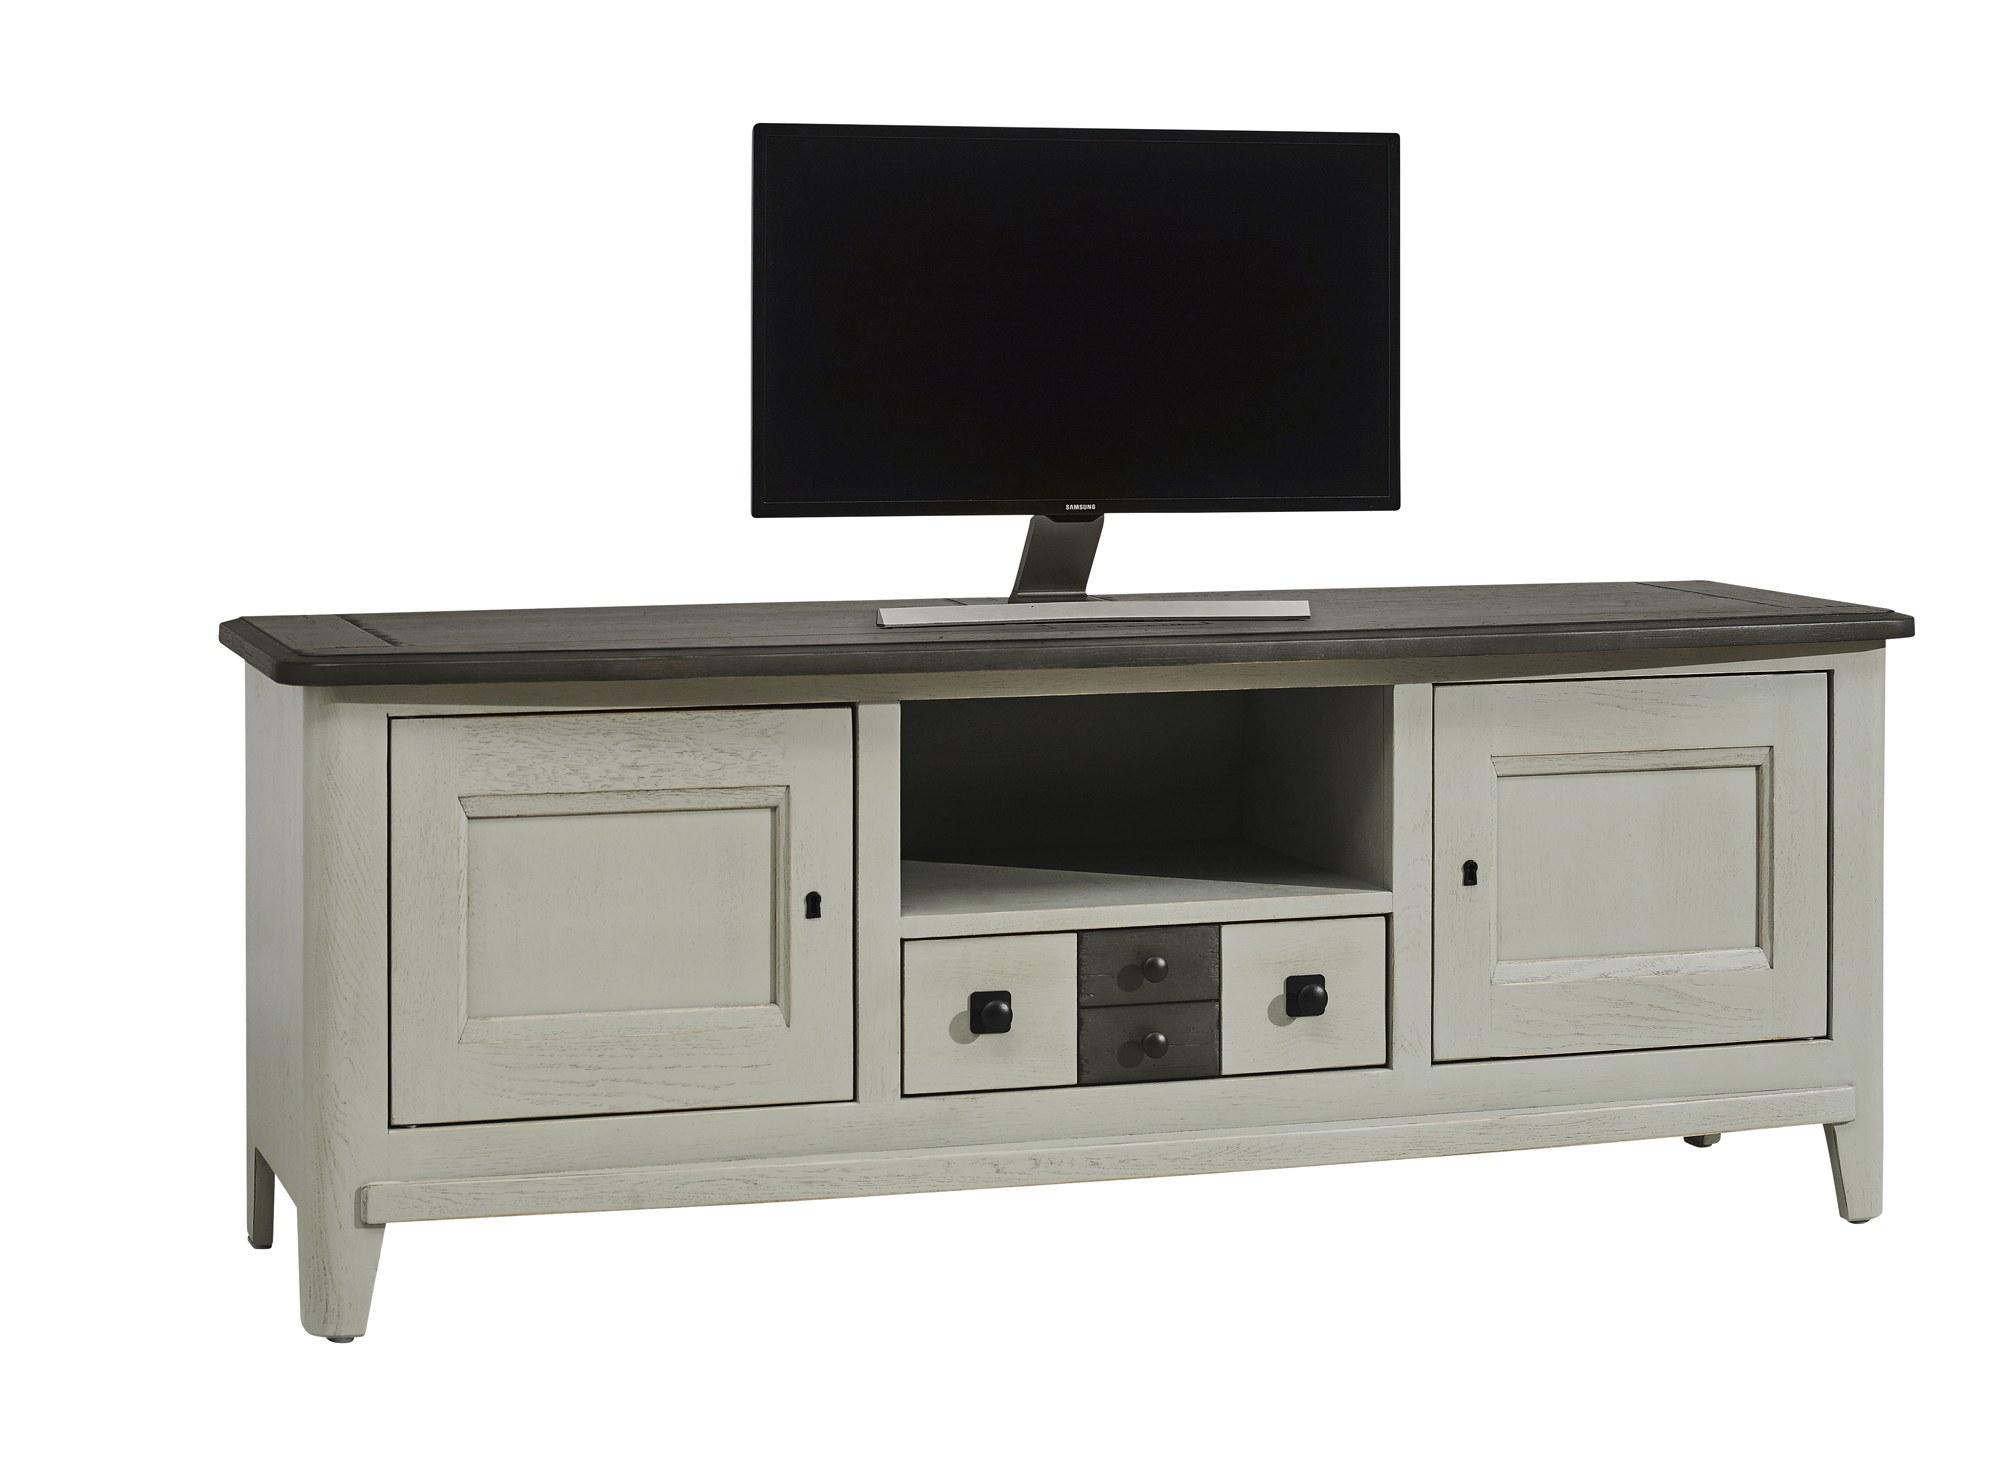 Séraphine chêne massif meuble TV